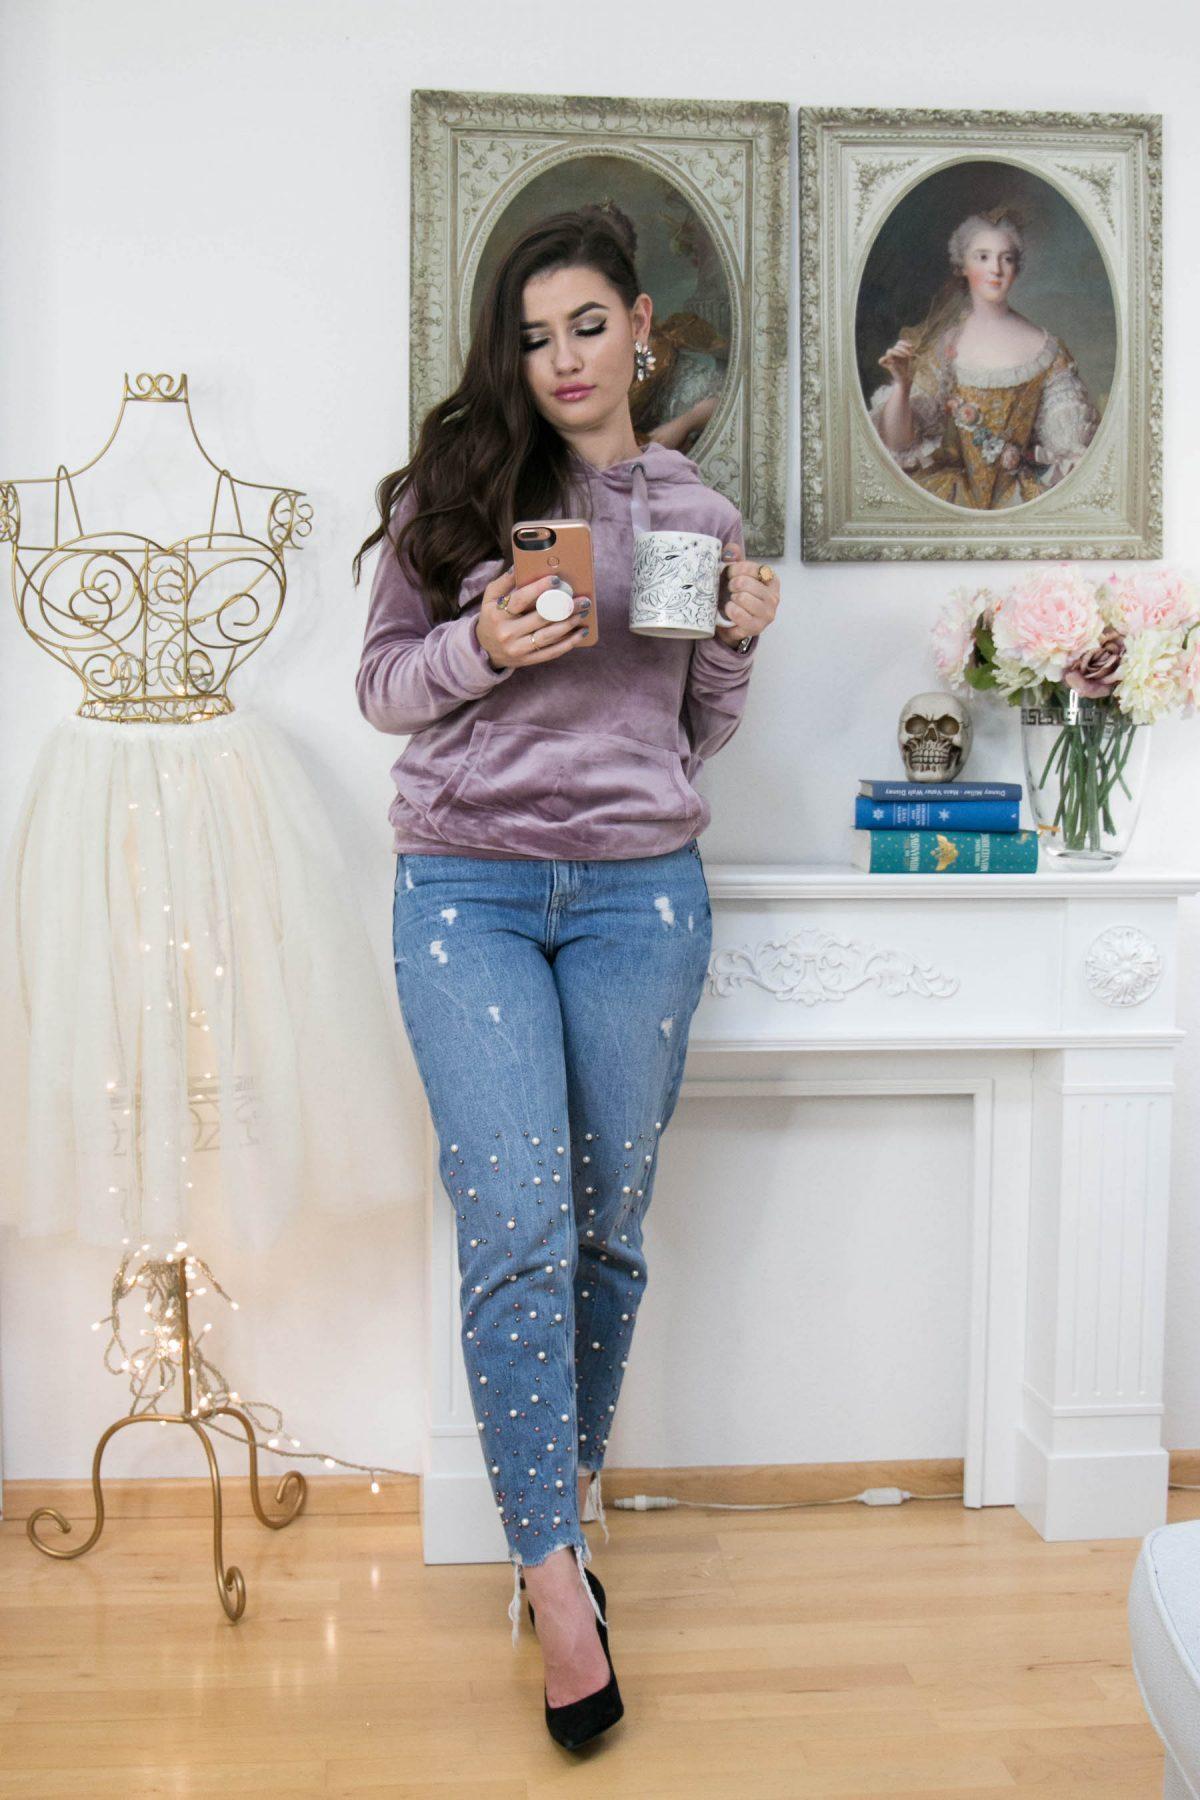 der figur guide f r jeden typ boyfriend jeans perfekt. Black Bedroom Furniture Sets. Home Design Ideas